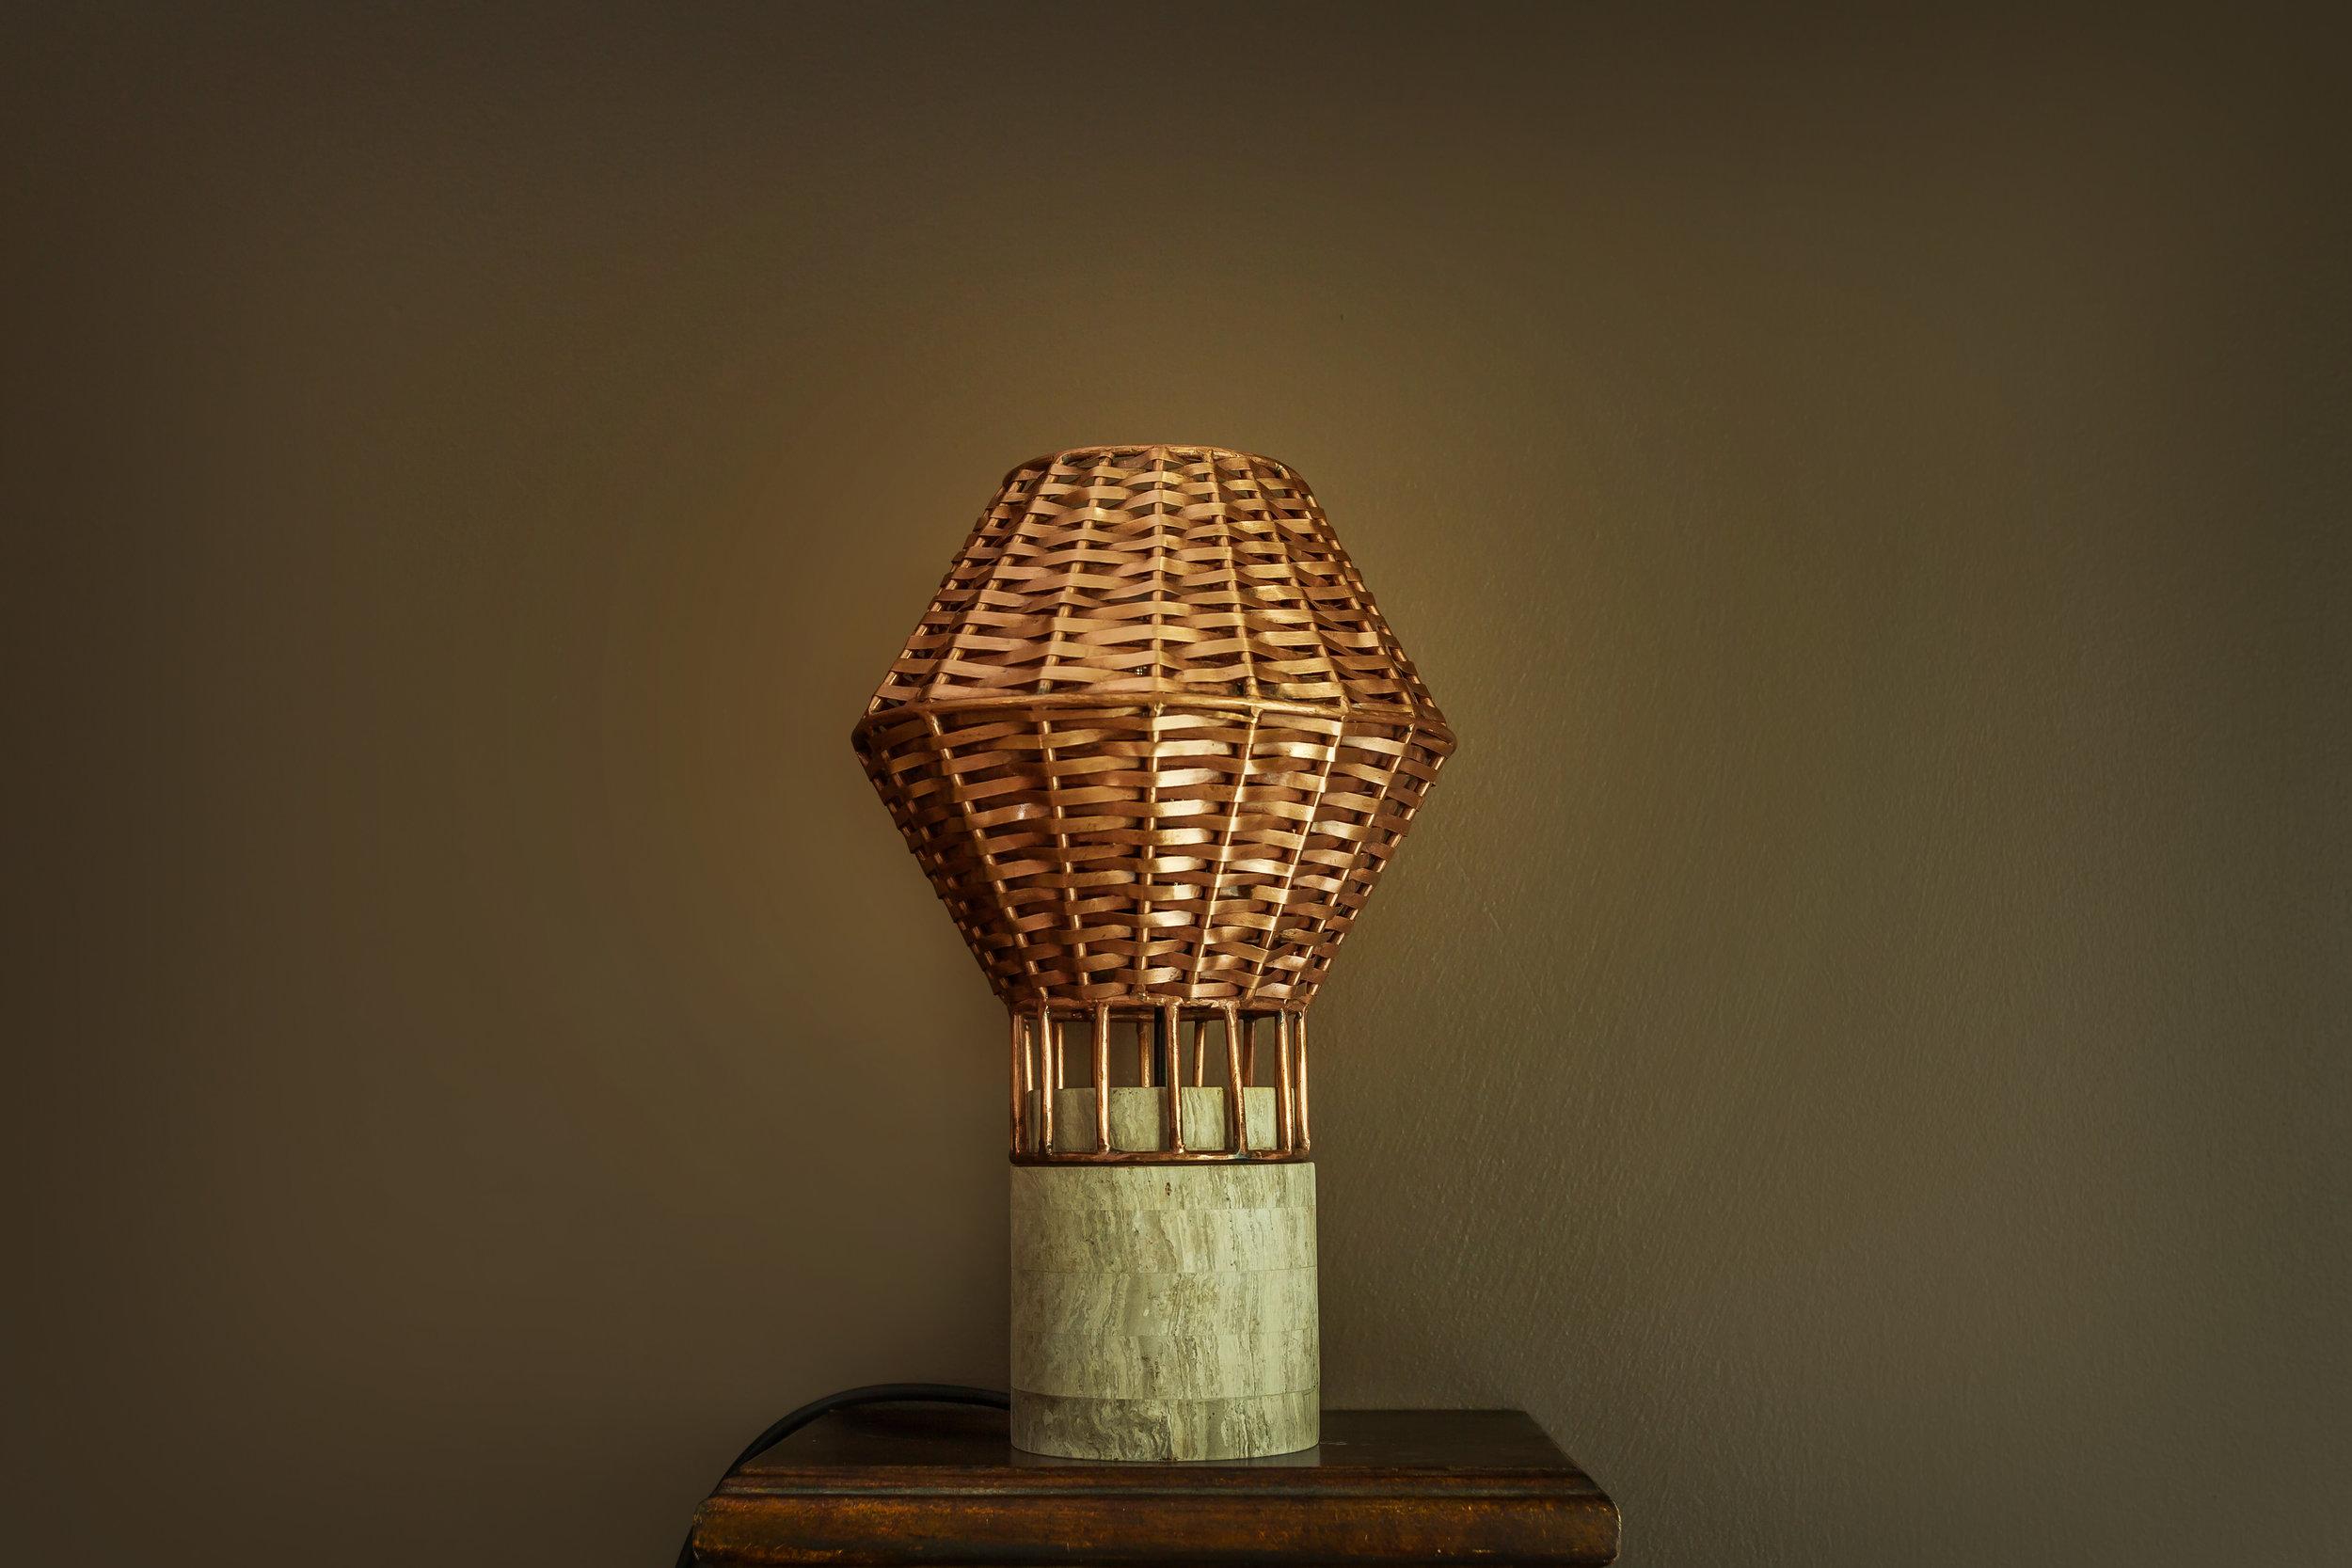 zoe - HI lamps 07.JPG